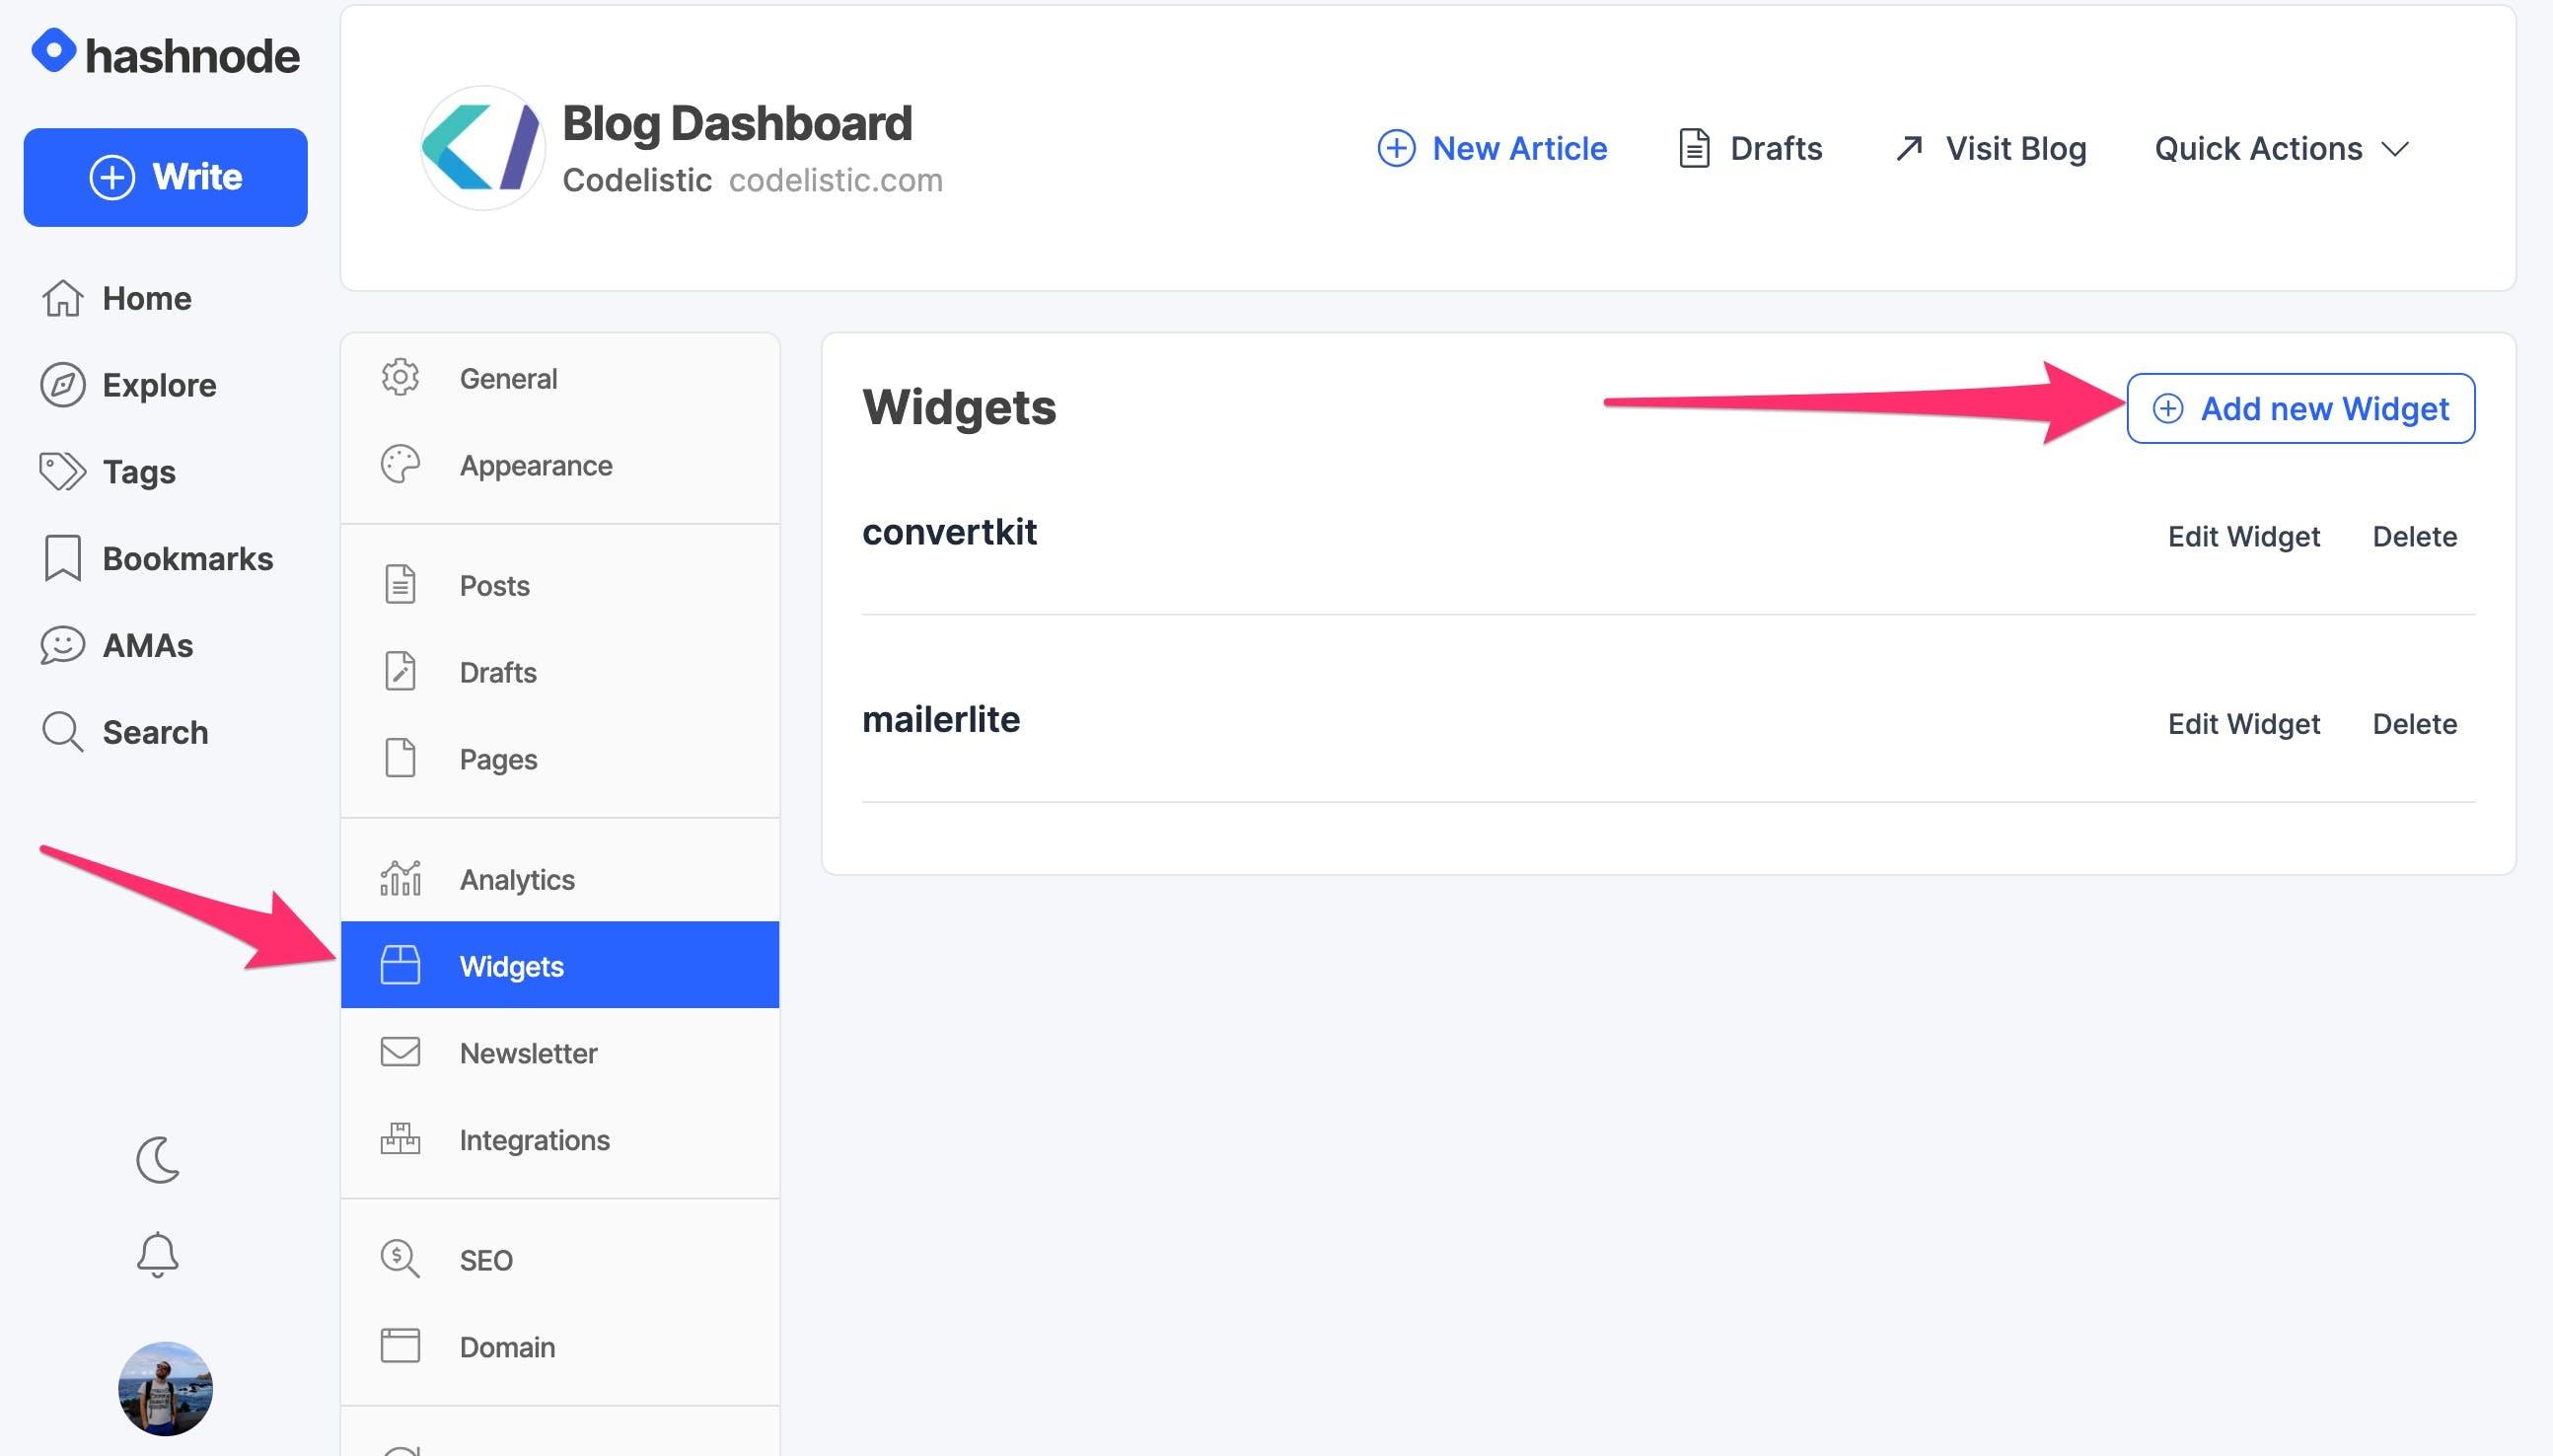 Hashnode Blog Dashboard showing the Widget tab and Add New Widget button